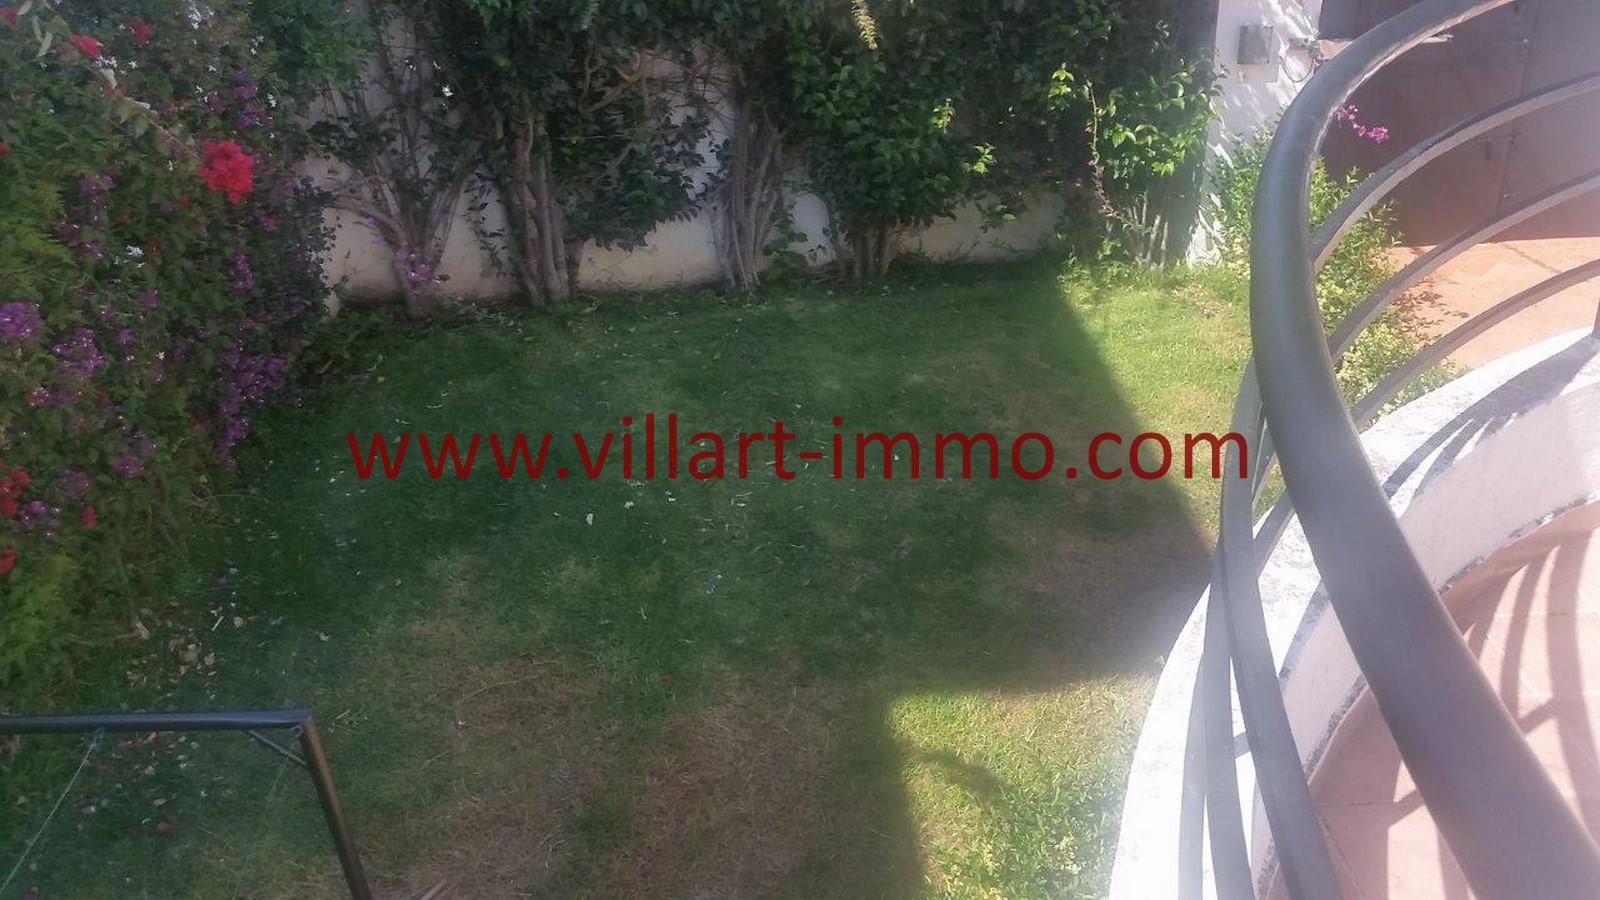 3-a-louer-villa-non-meuble-tanger-jardin-lv967-villart-immo